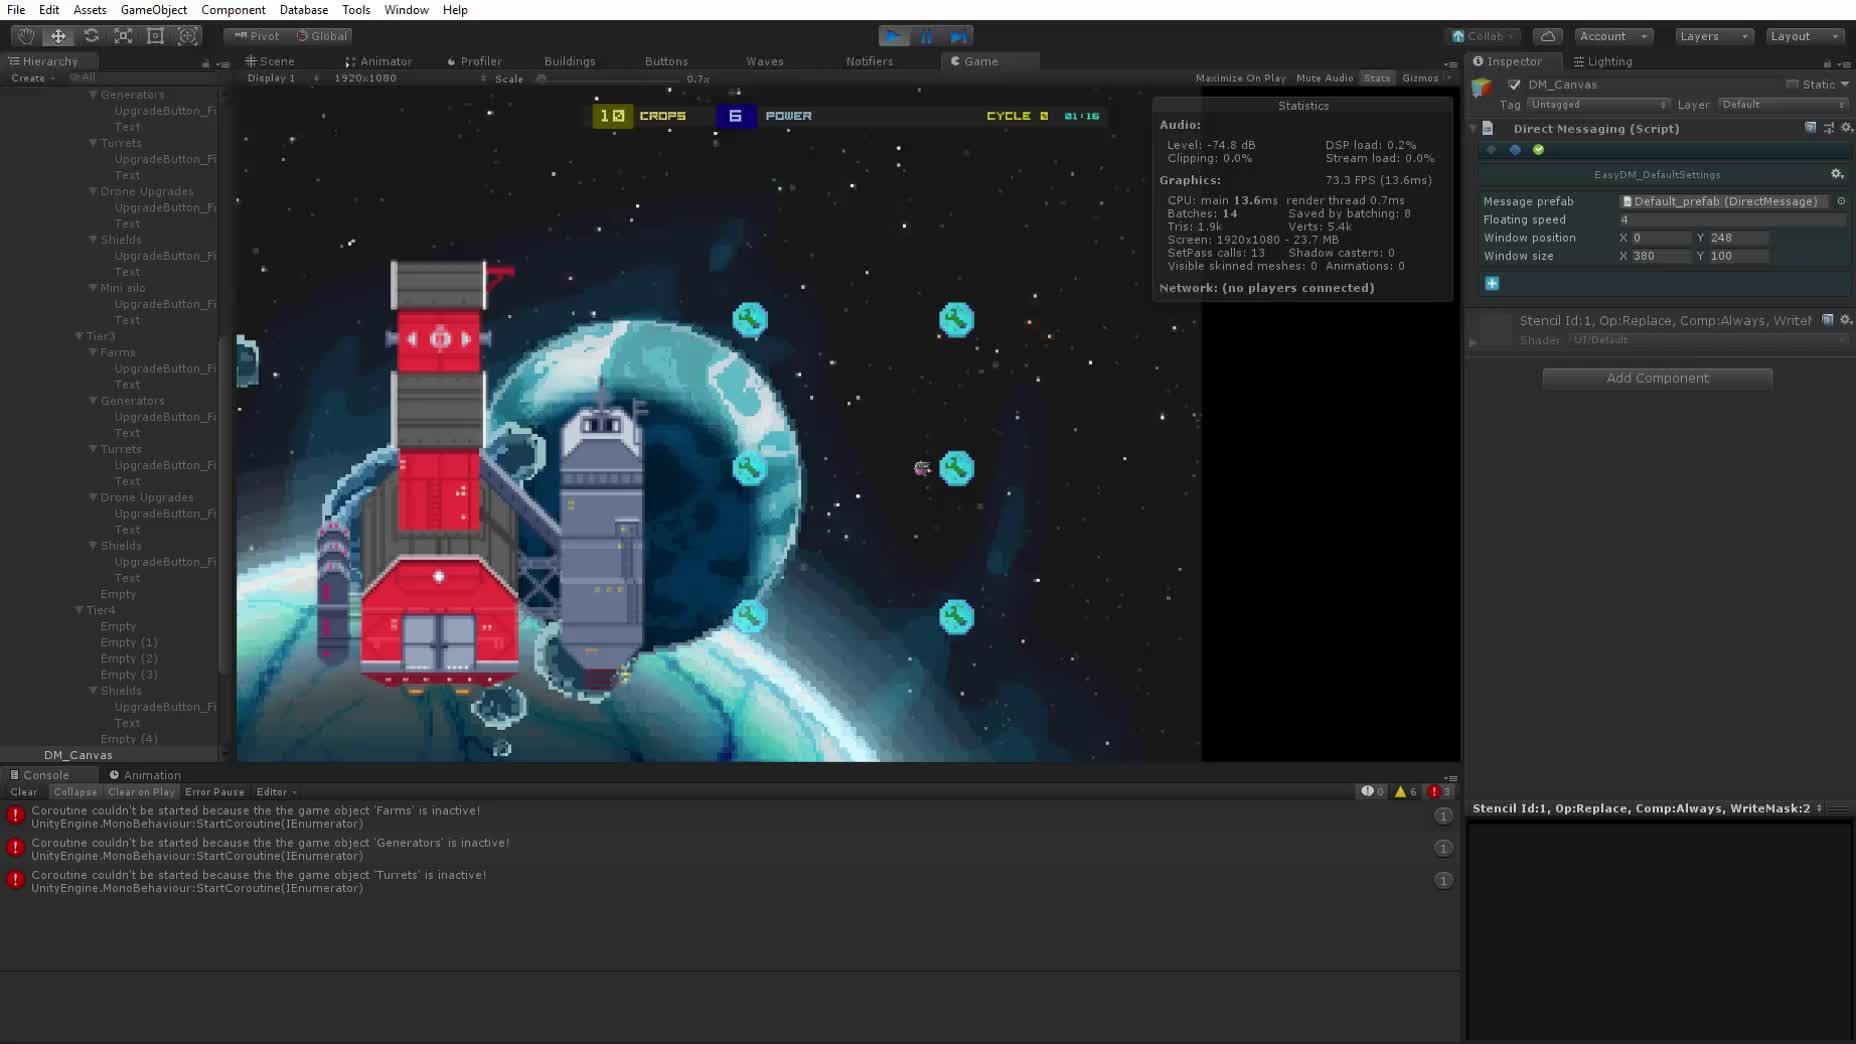 Unity 2018.1.5f1 Personal (64bit) - 2 GameScene.unity - Starfarmer - PC, Mac & Linux Standalone DX11  27 08 2018 19 44 39 GIFs